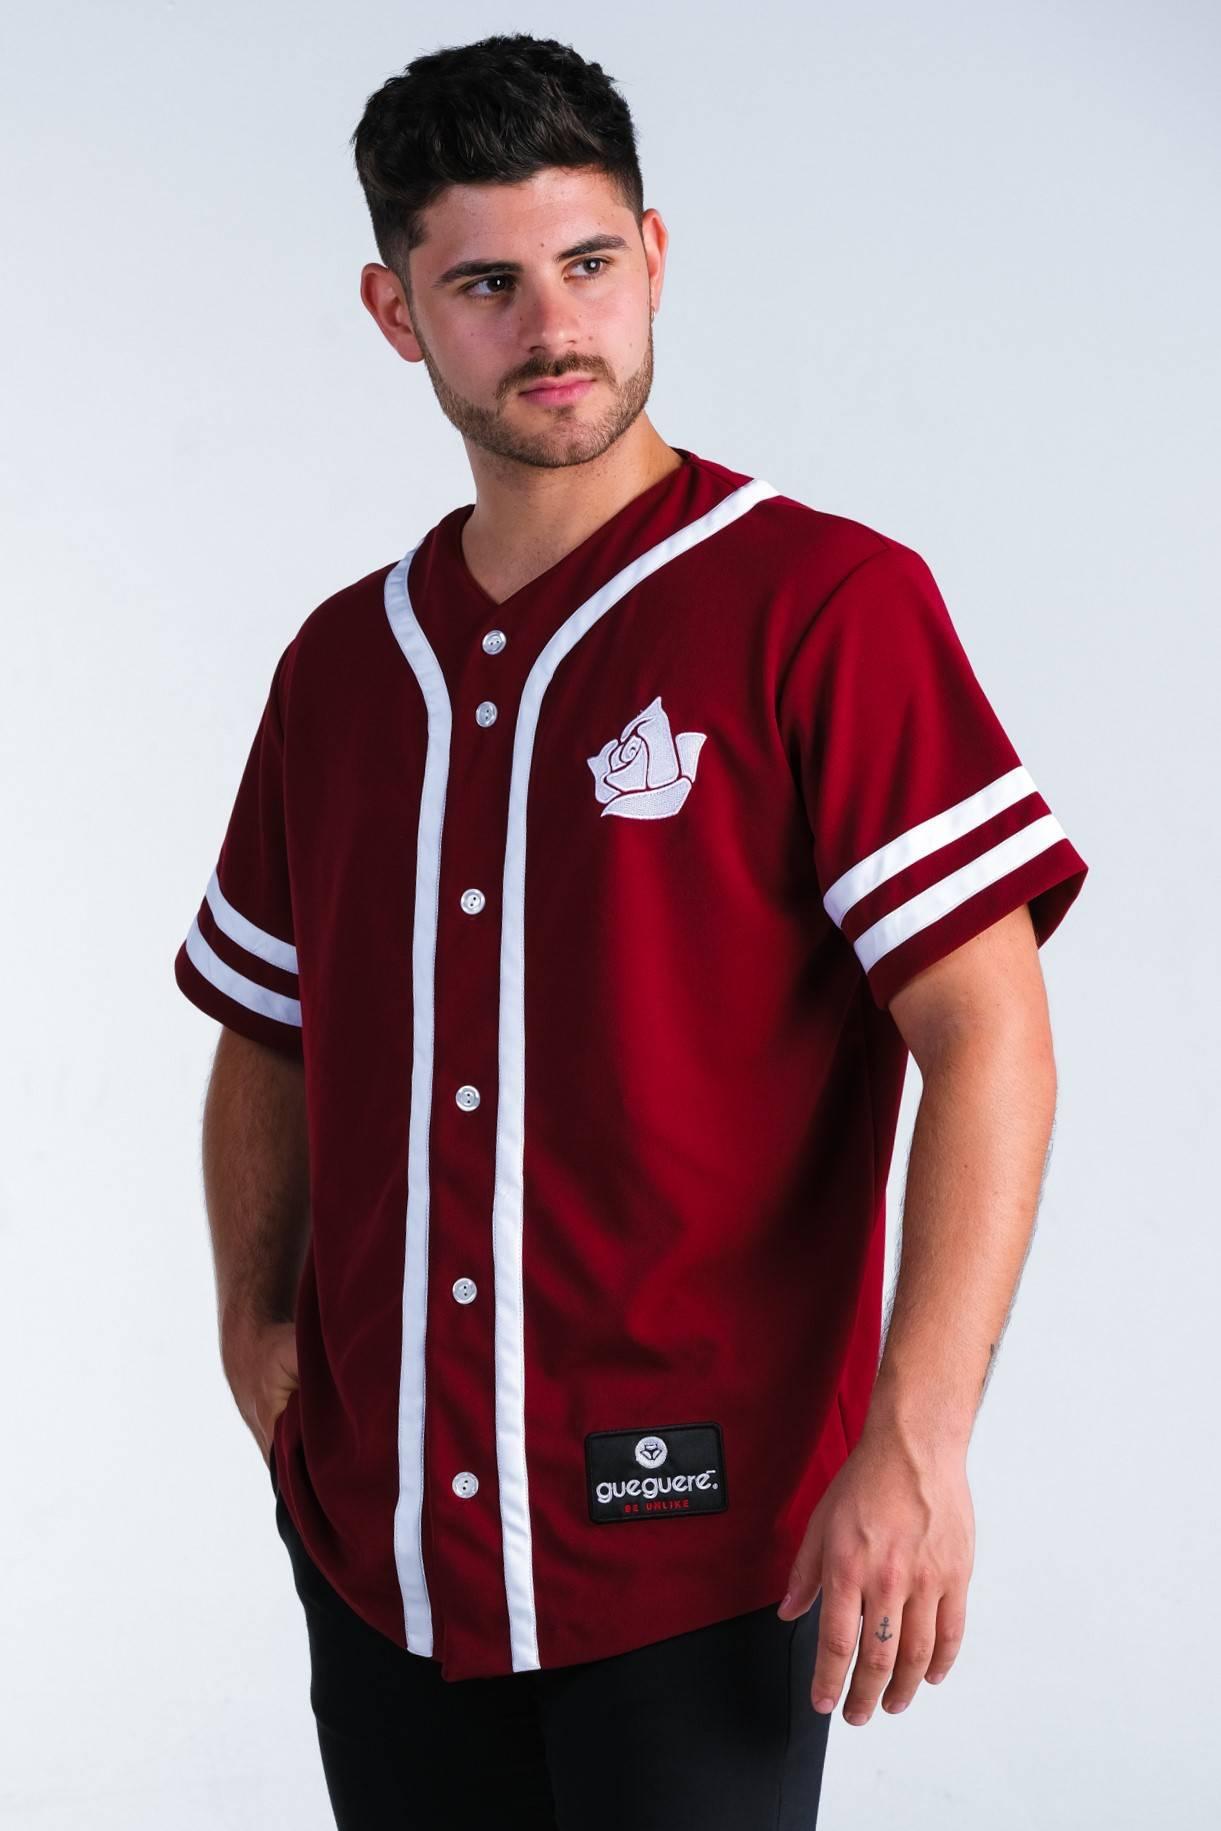 YQSB Personalizada Camiseta Deportiva Baseball Jersey Liga de b/éisbol NO.10 Moncada Chicago White Sox